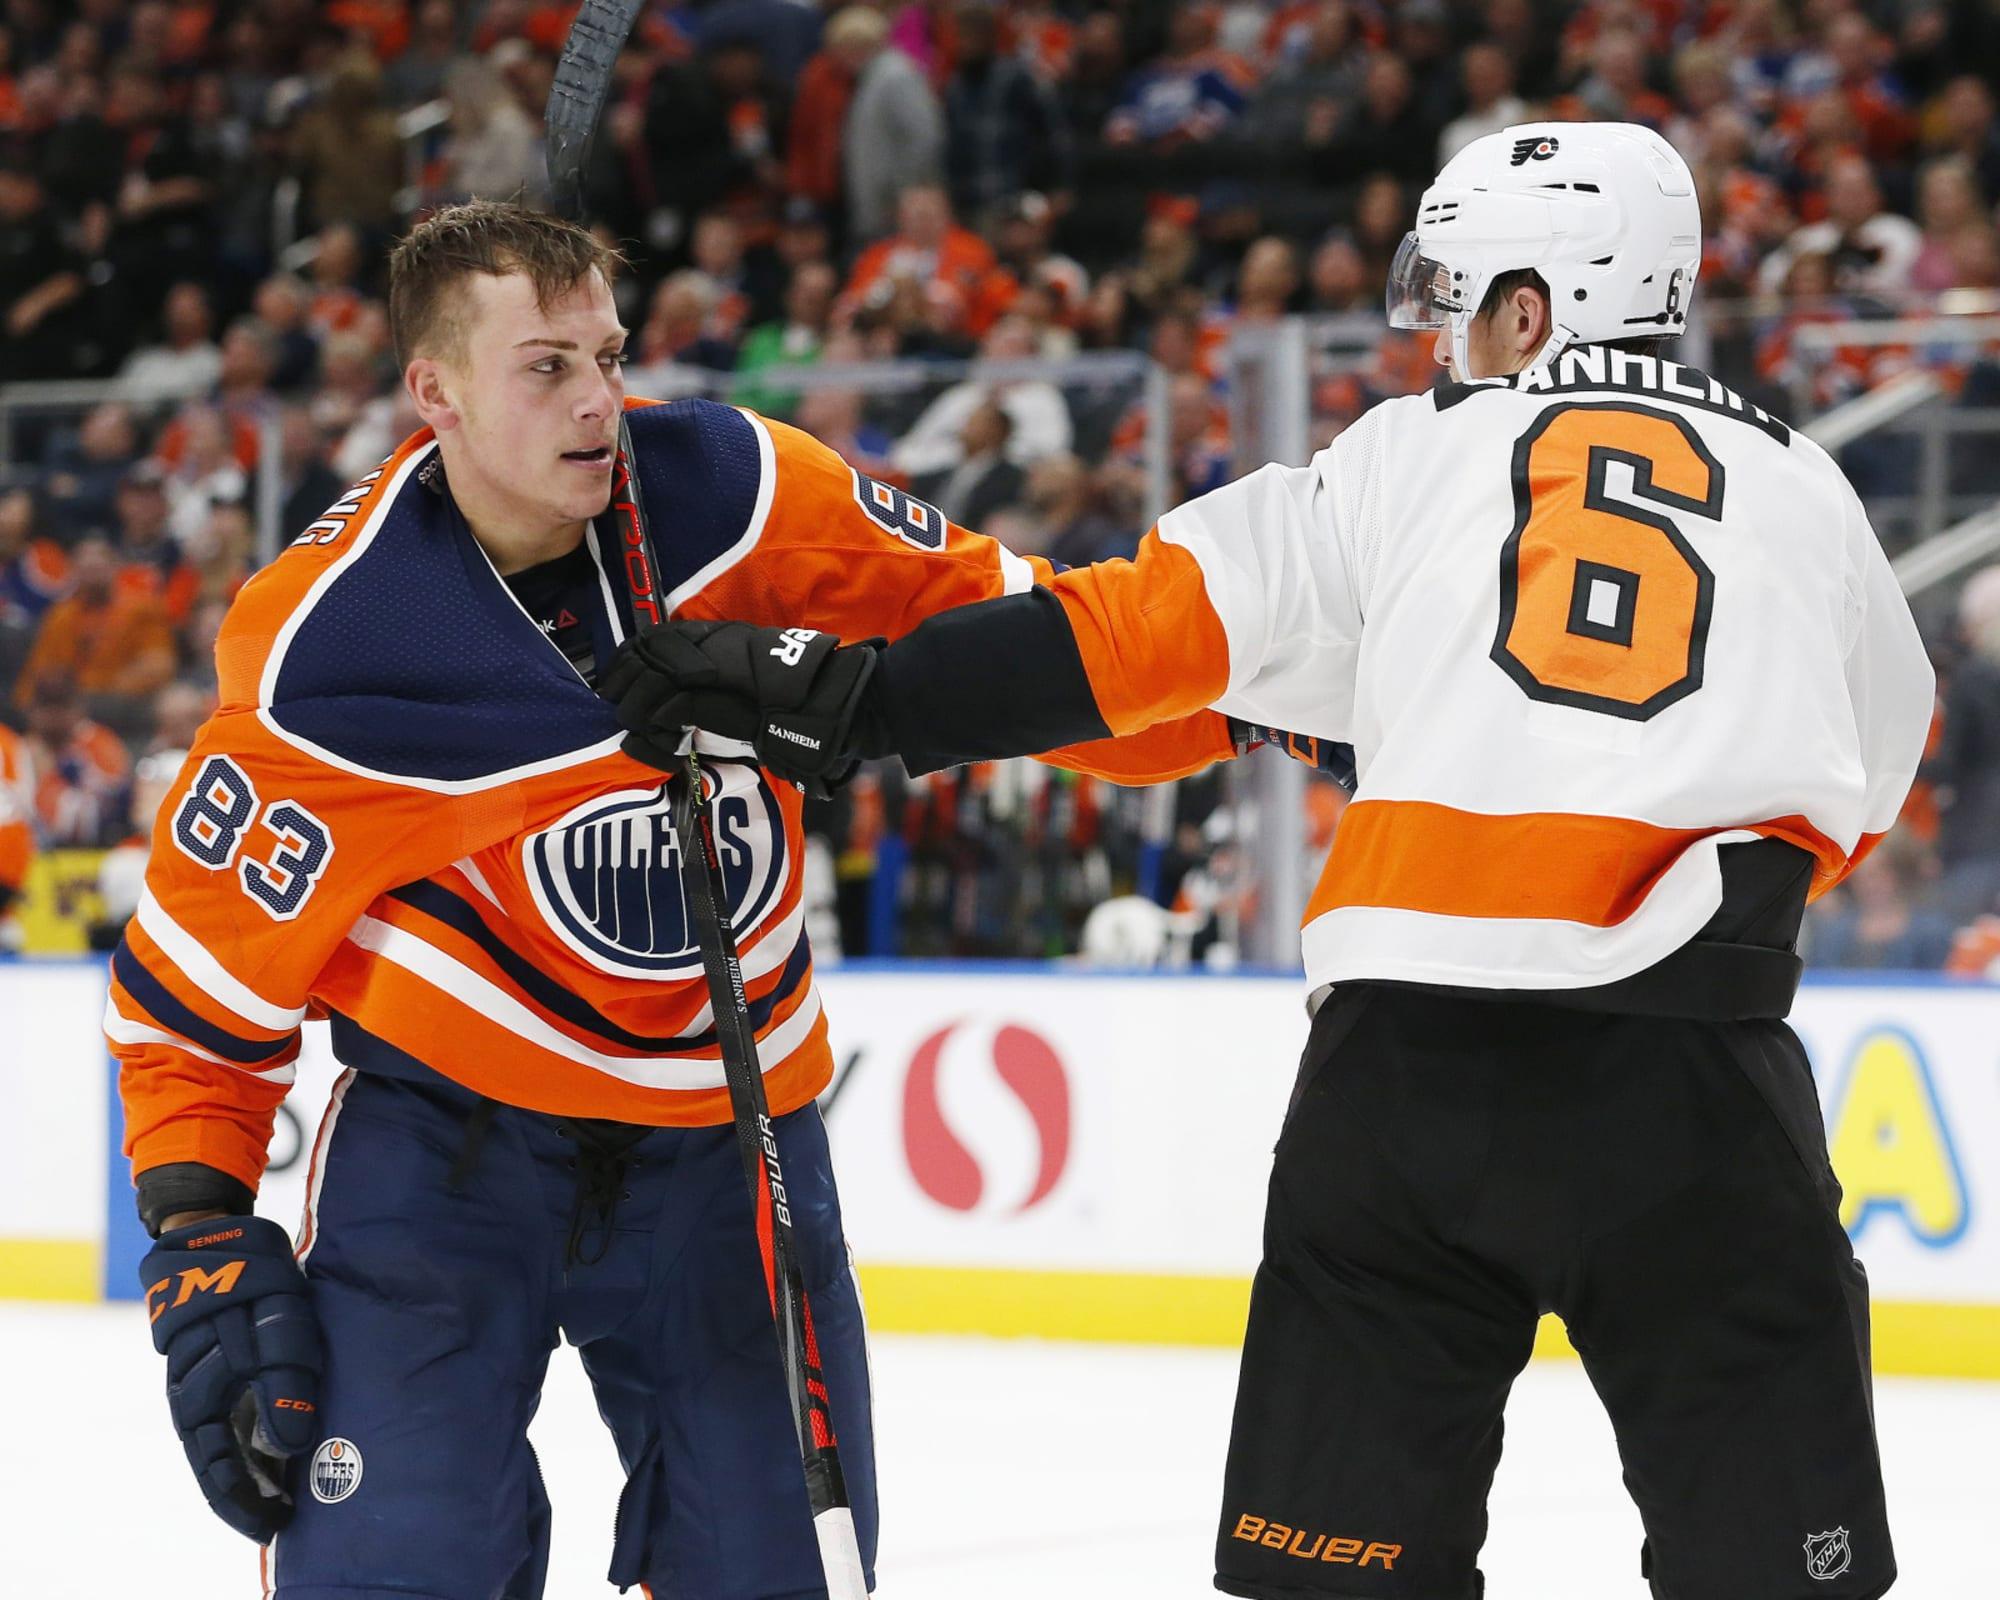 Flyers looking to strike oil in their first road trip of season